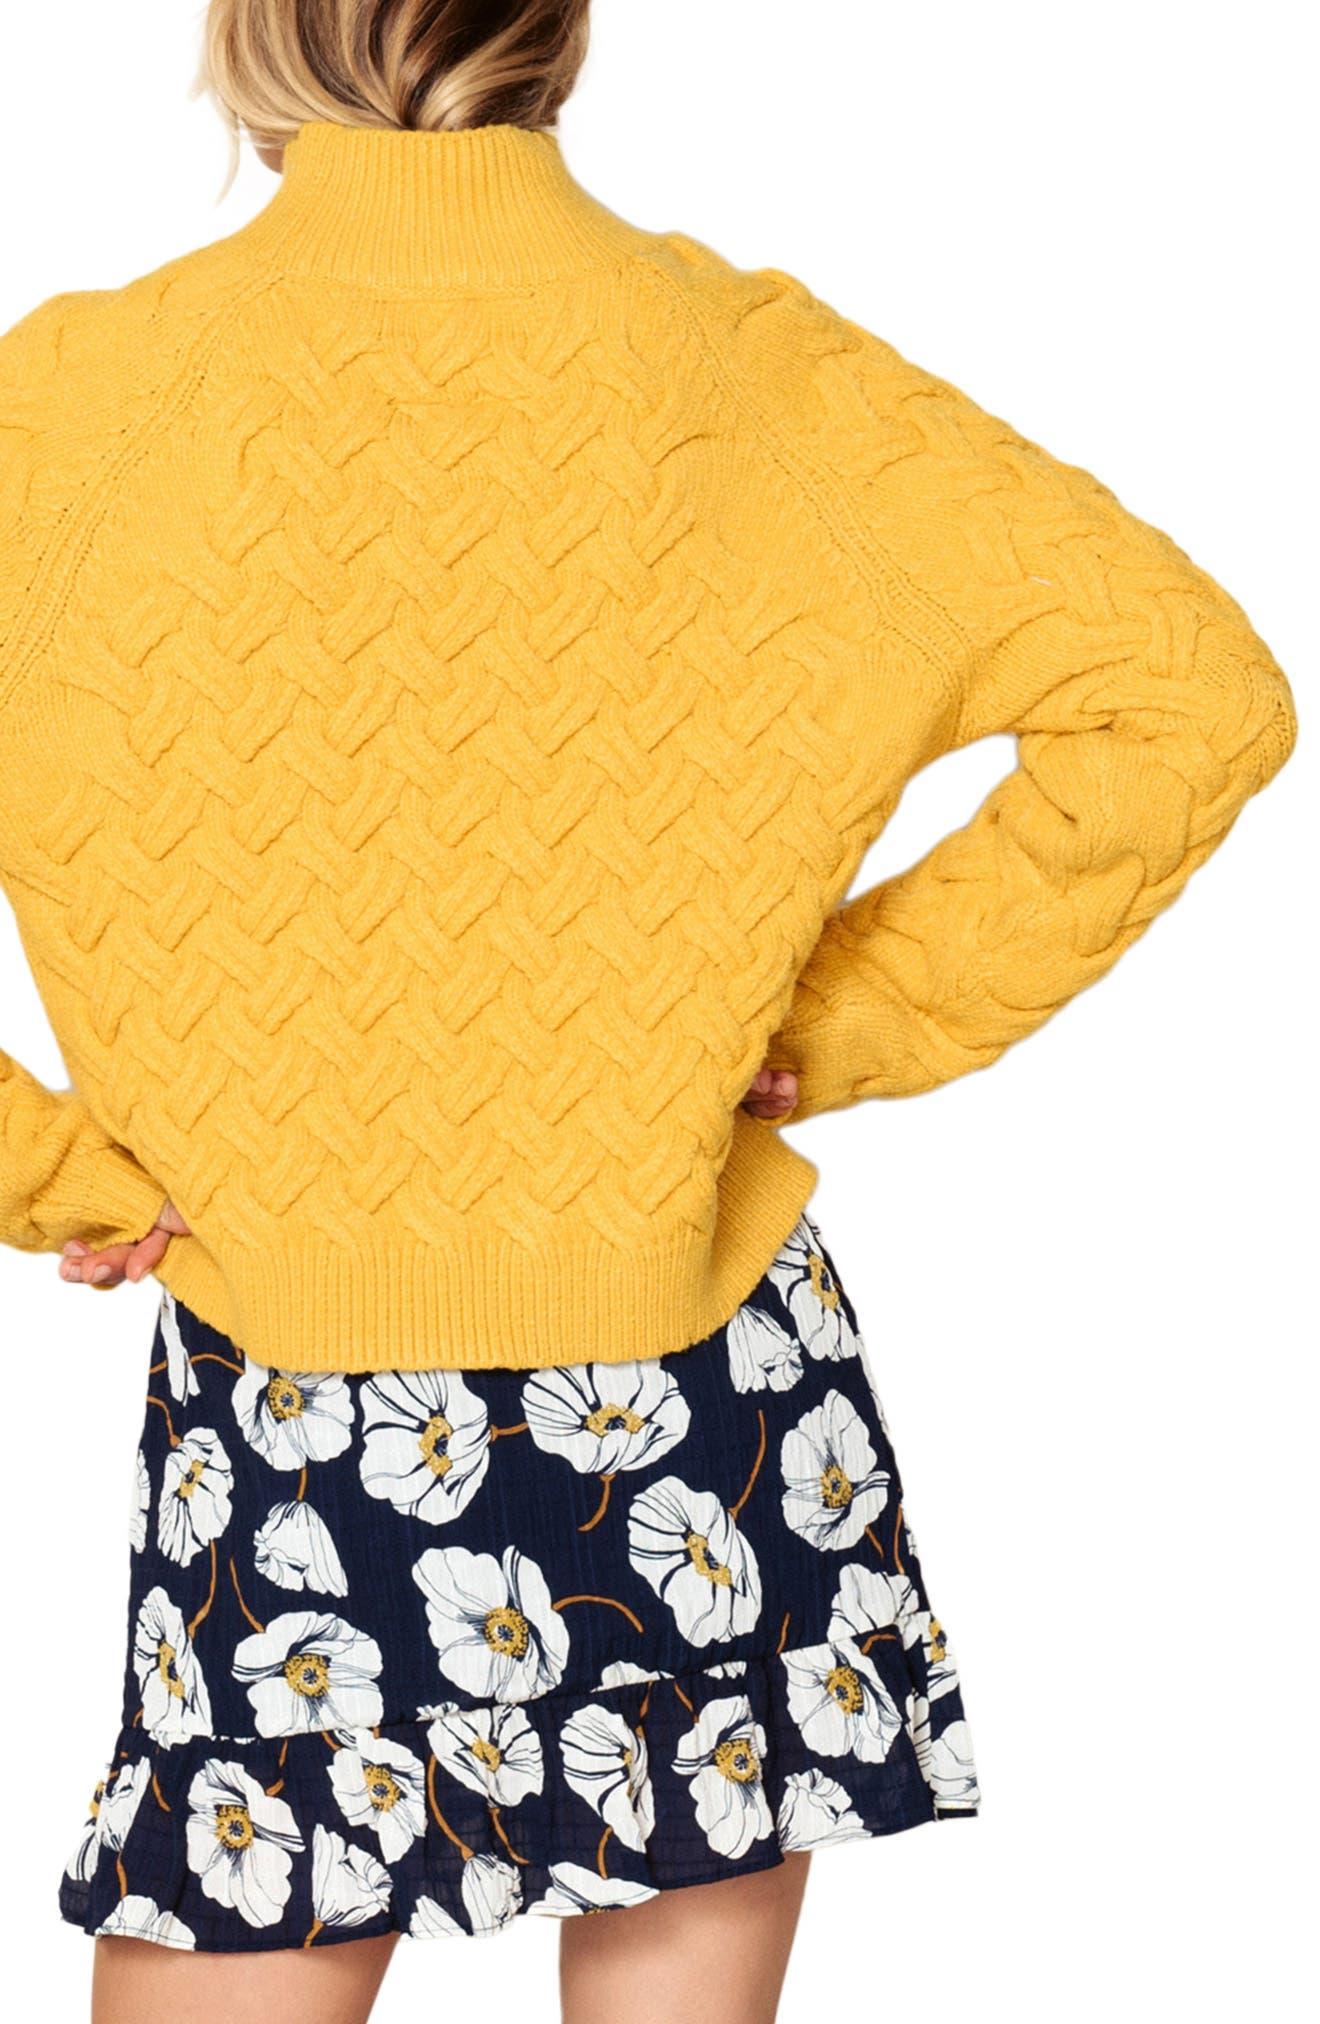 Adele Sweater,                             Alternate thumbnail 2, color,                             BUTTERSCOTCH